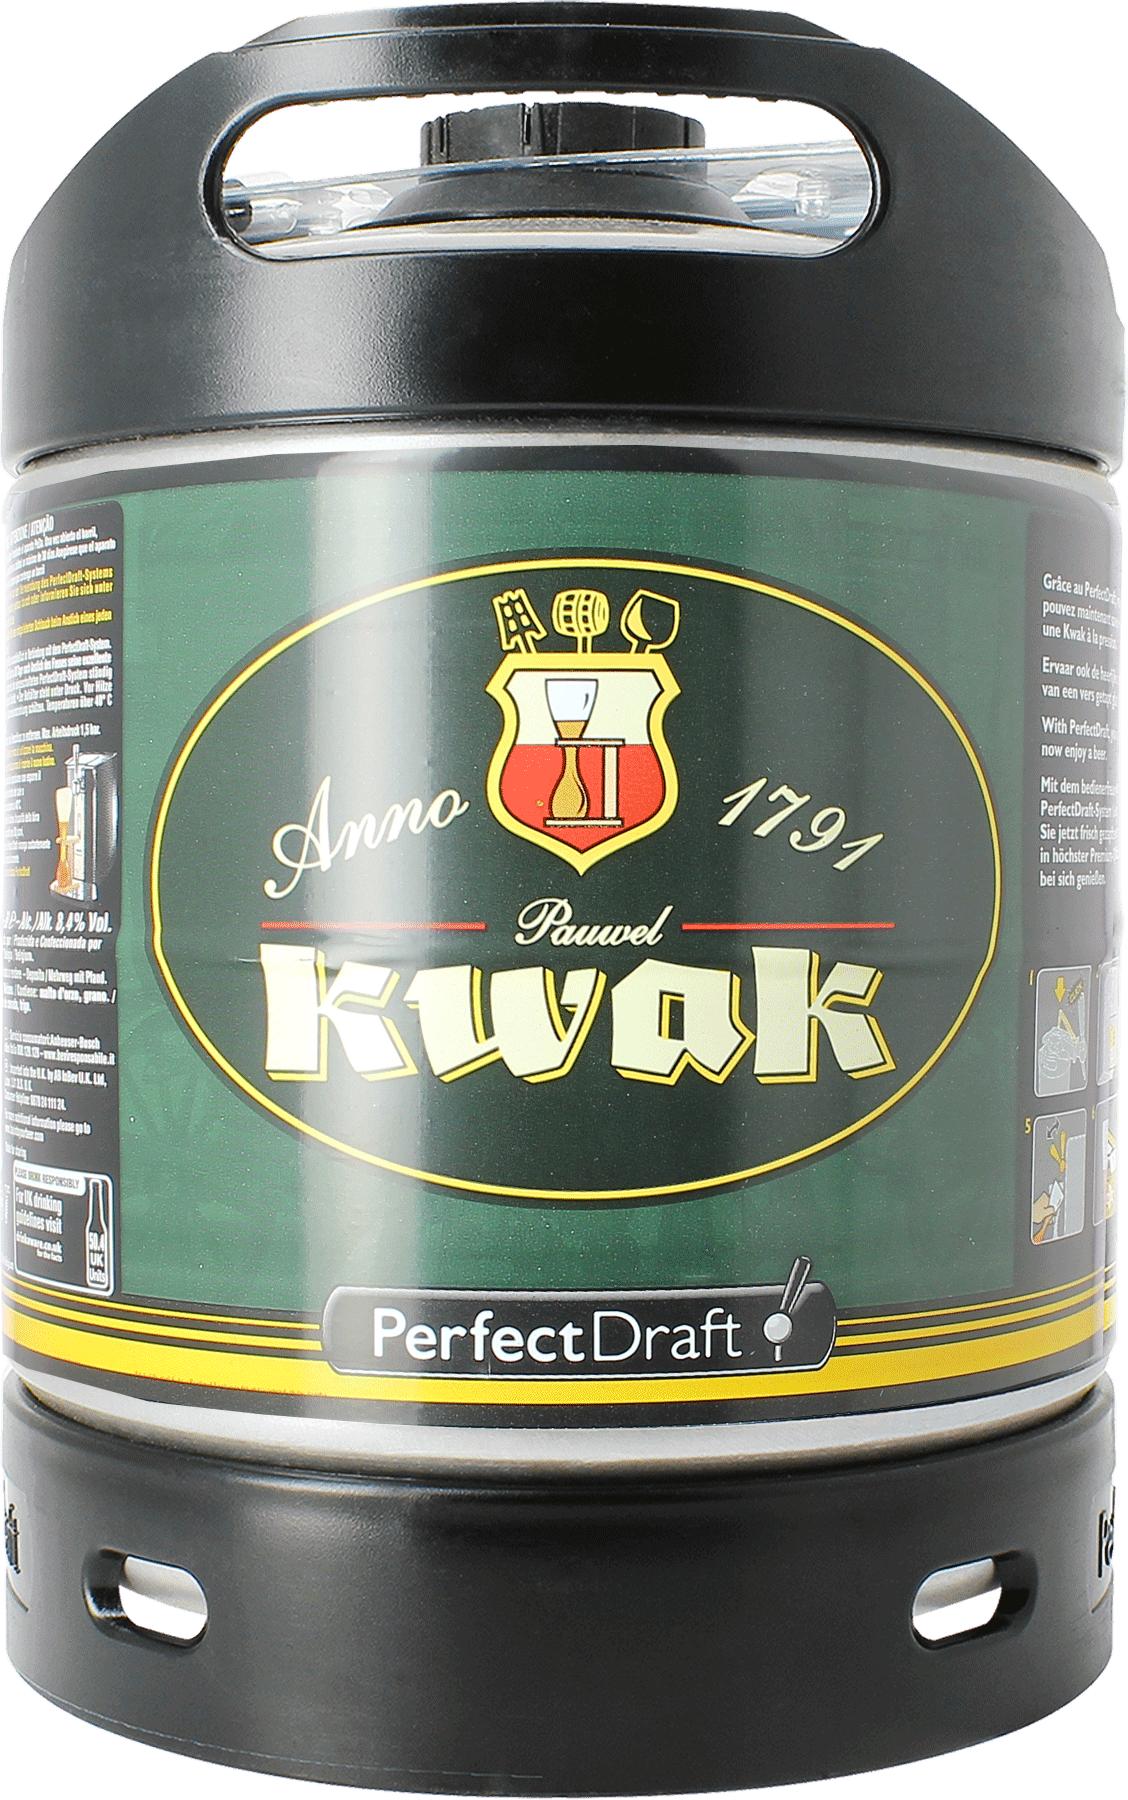 Kwak PerfectDraft 6-litre Barril